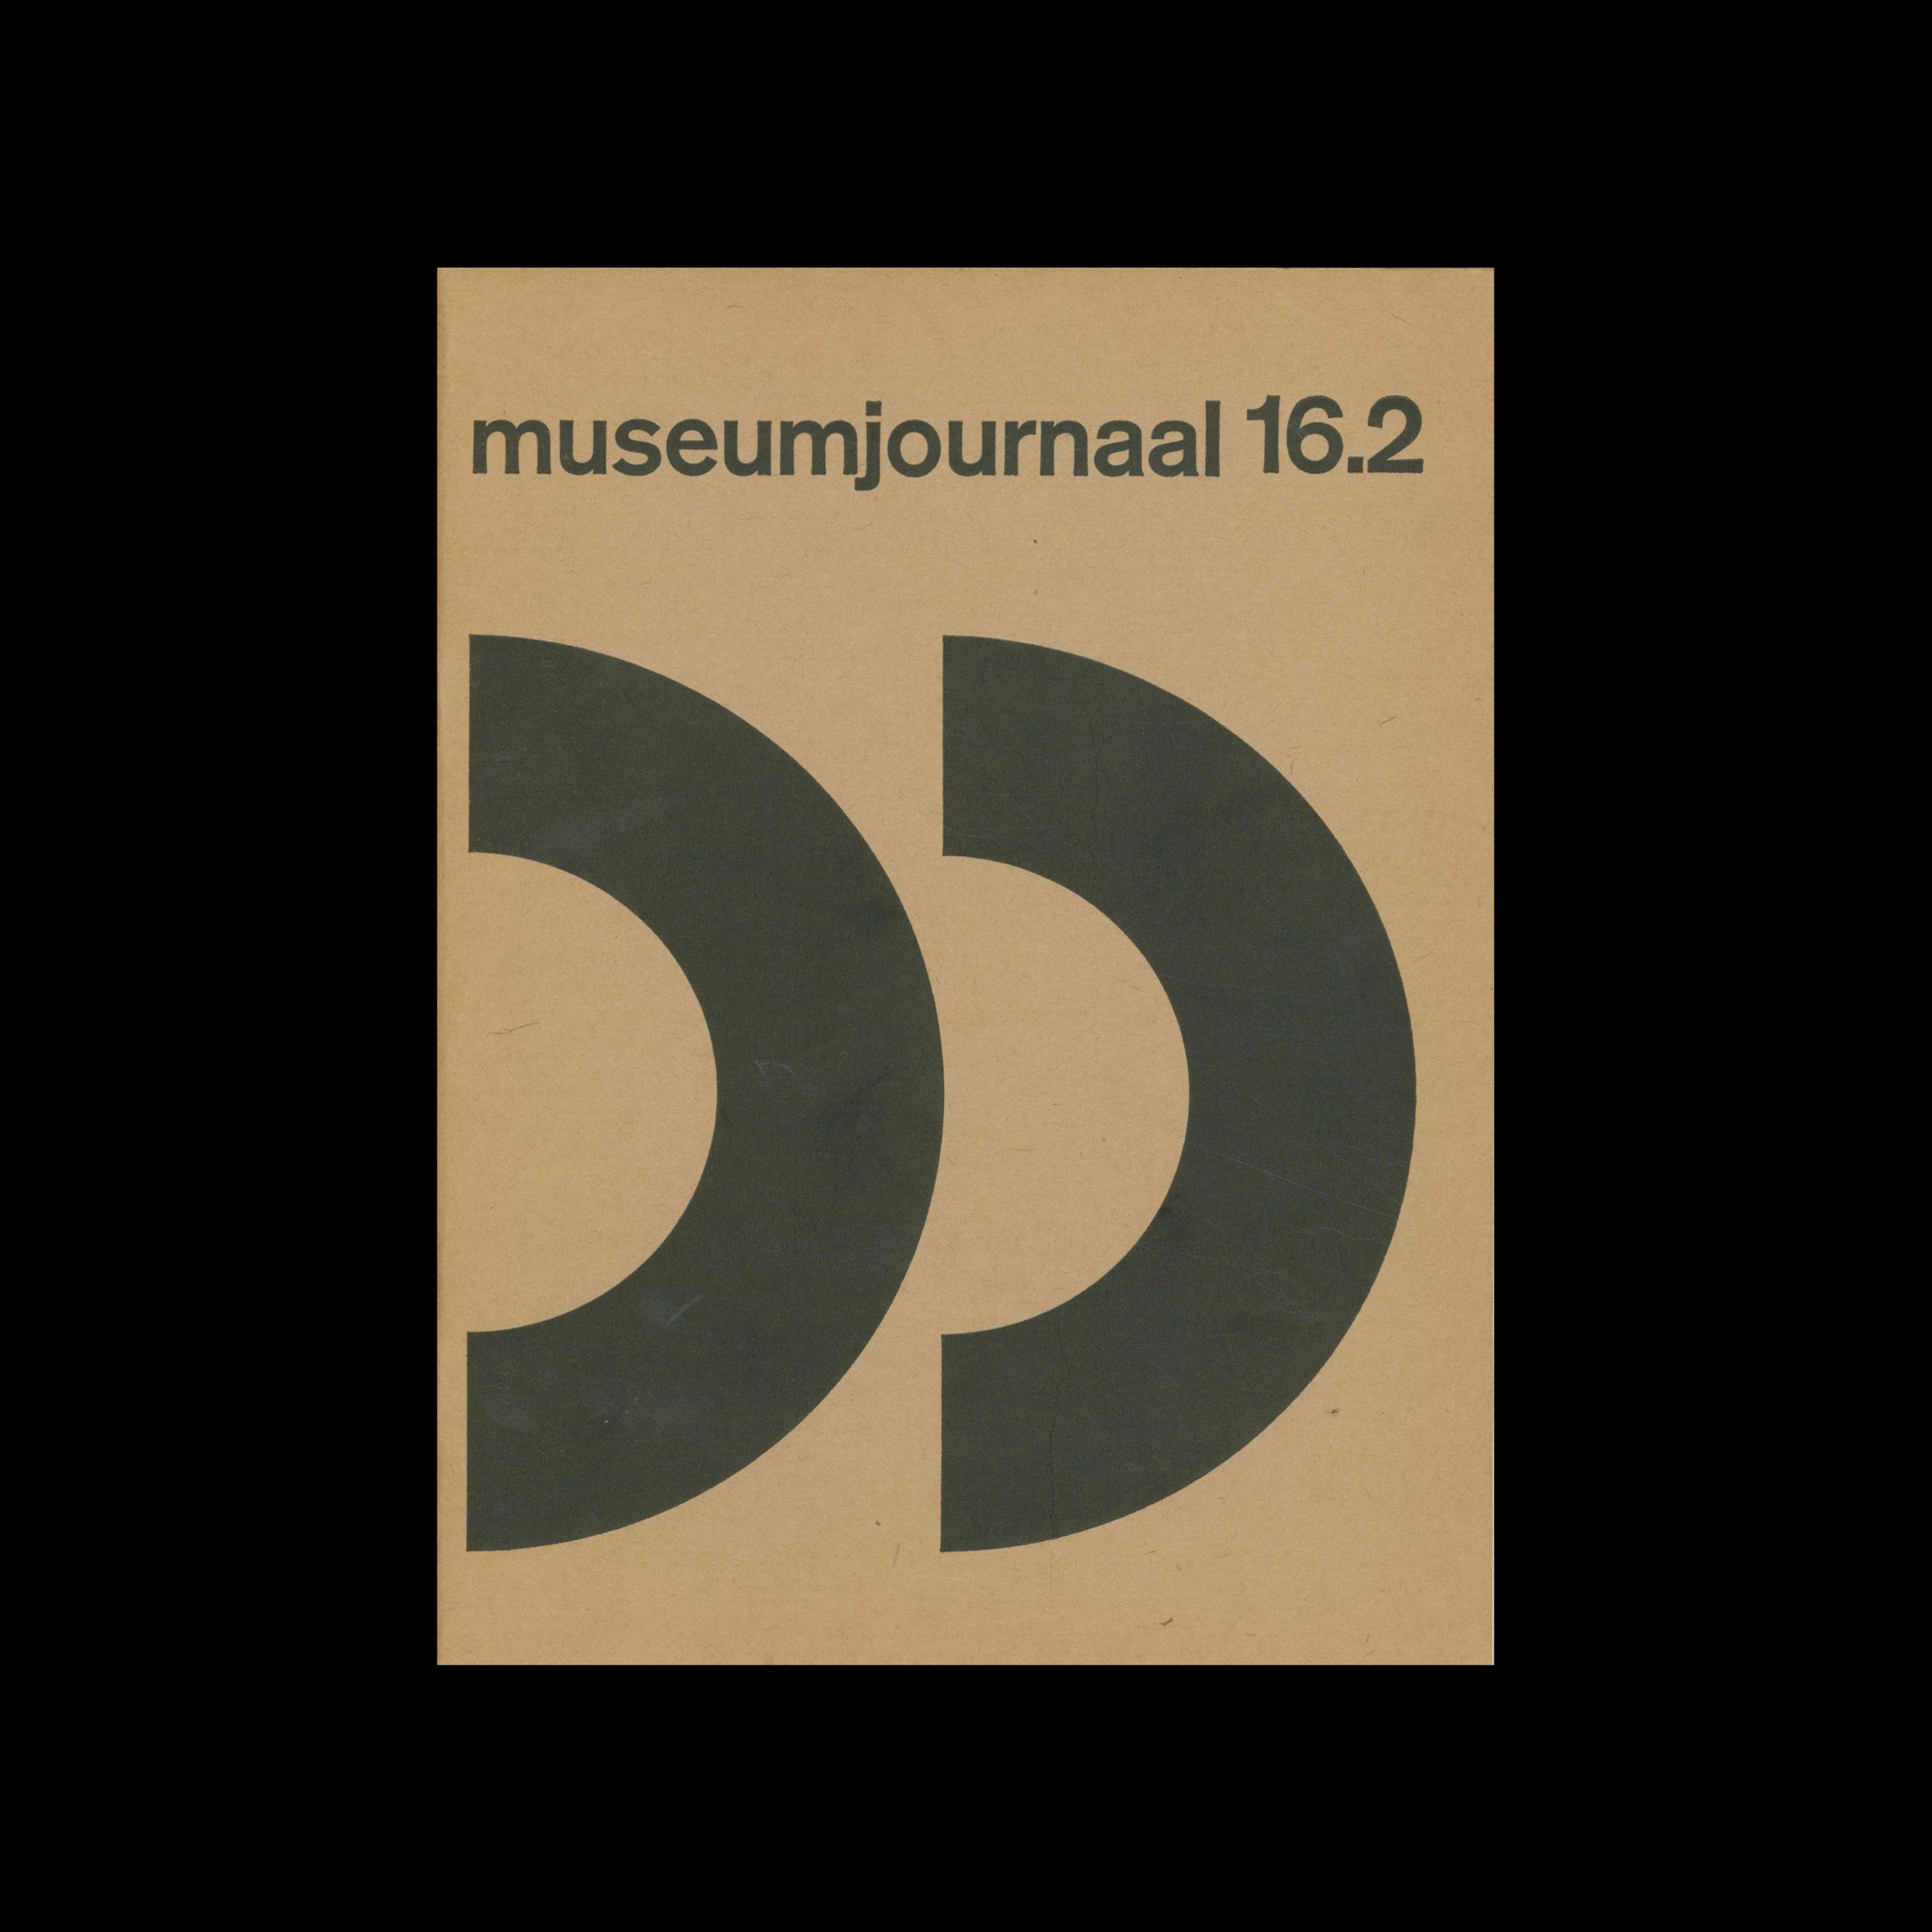 Museumjournaal, Serie 16 no2, 1971. Designed by Jurriaan Schrofer.